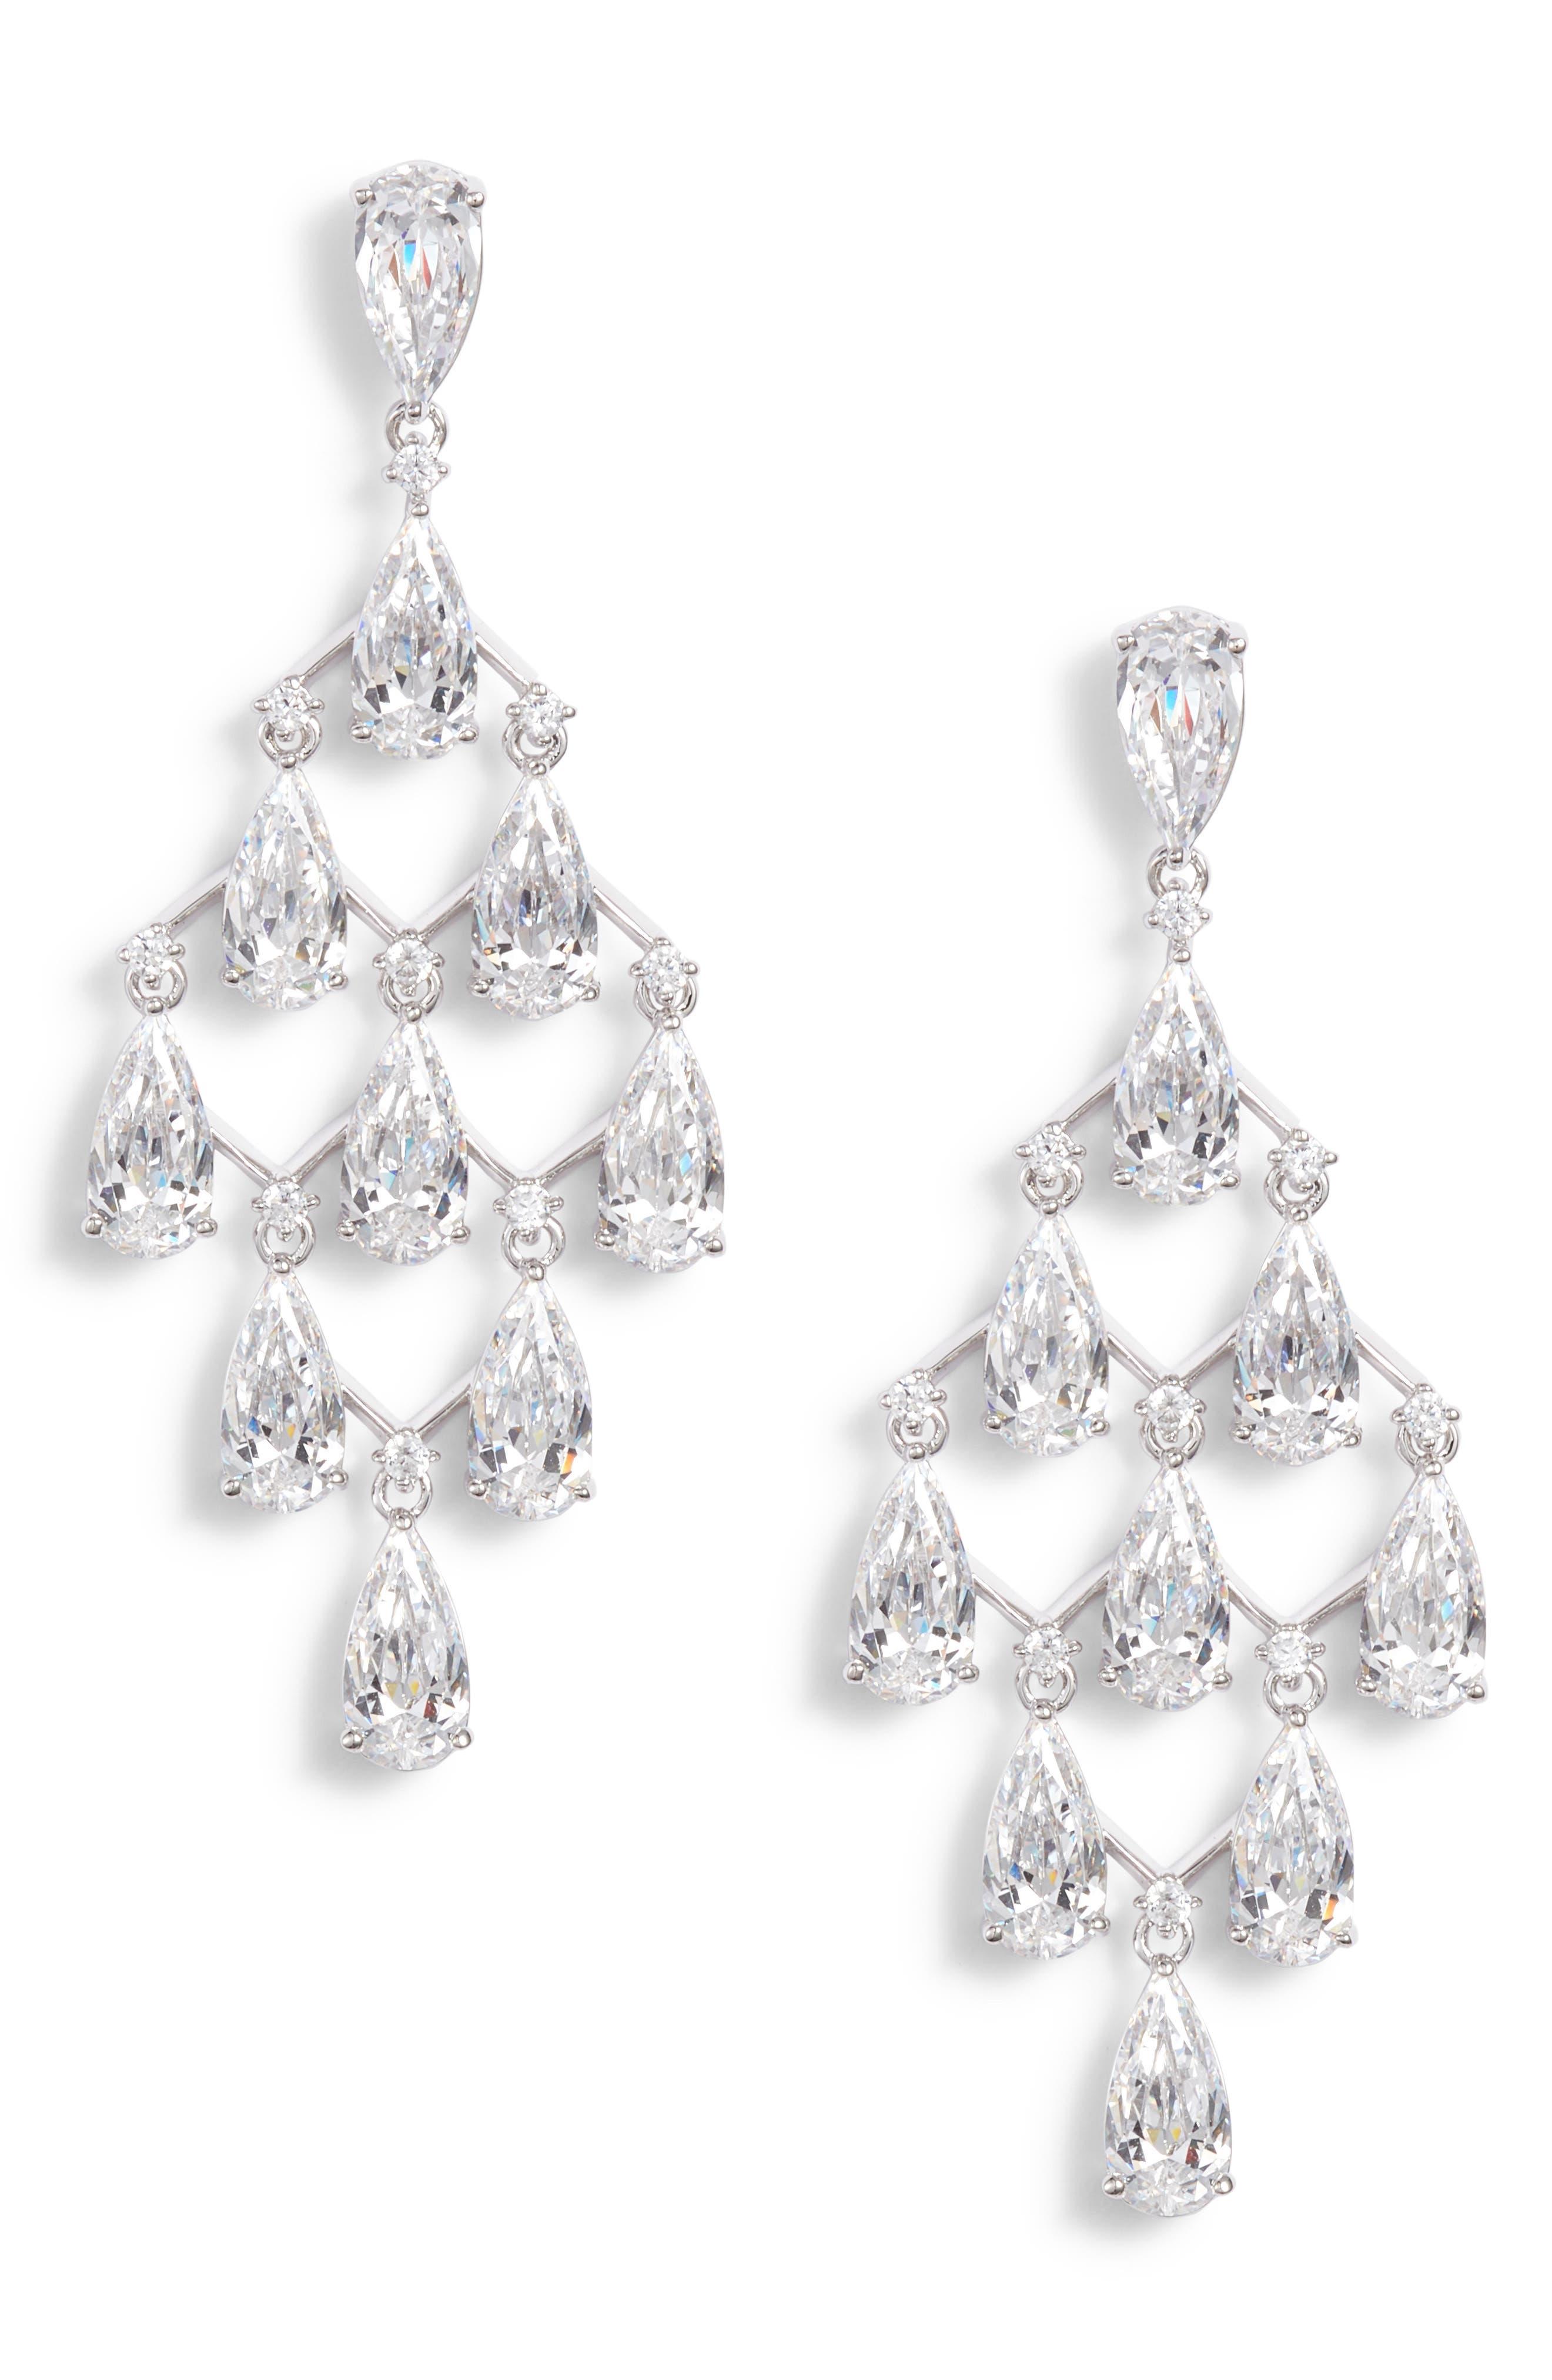 Kite Chandelier Earrings,                         Main,                         color, Silver